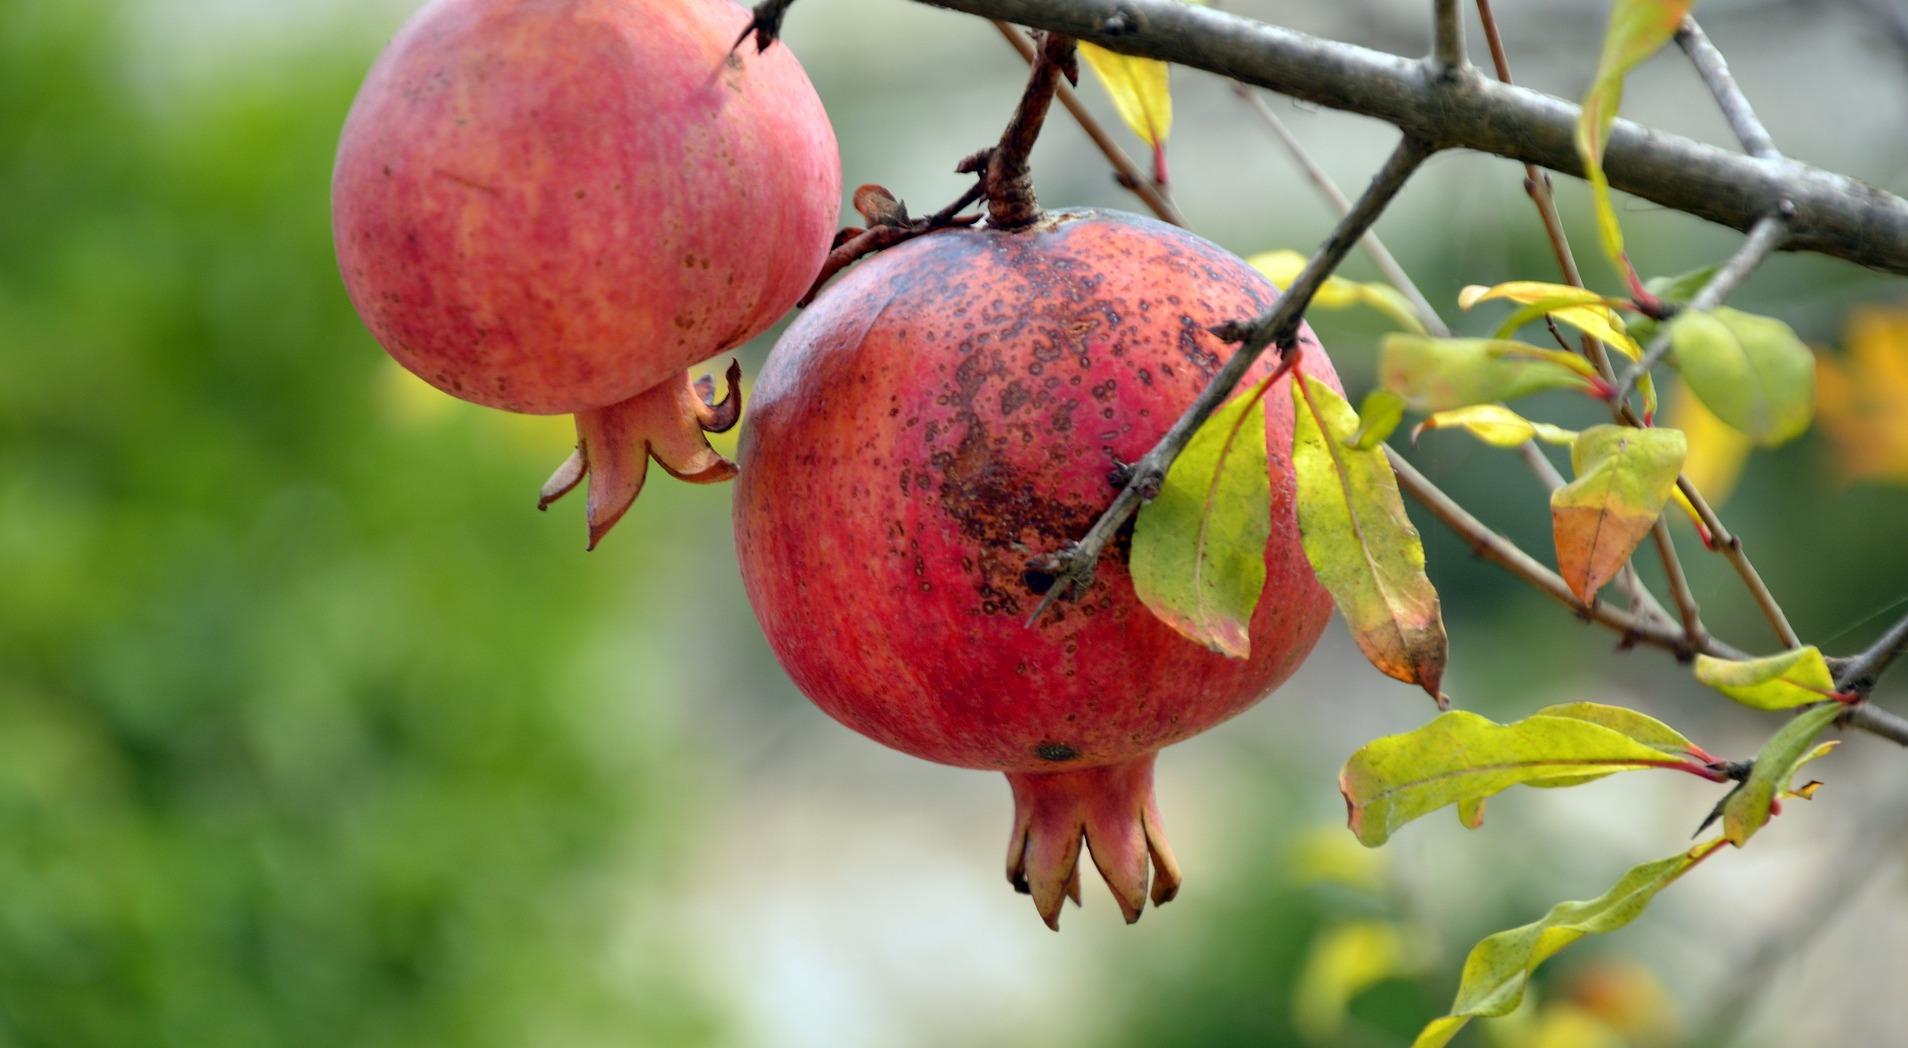 pomegranate-3752112_1920